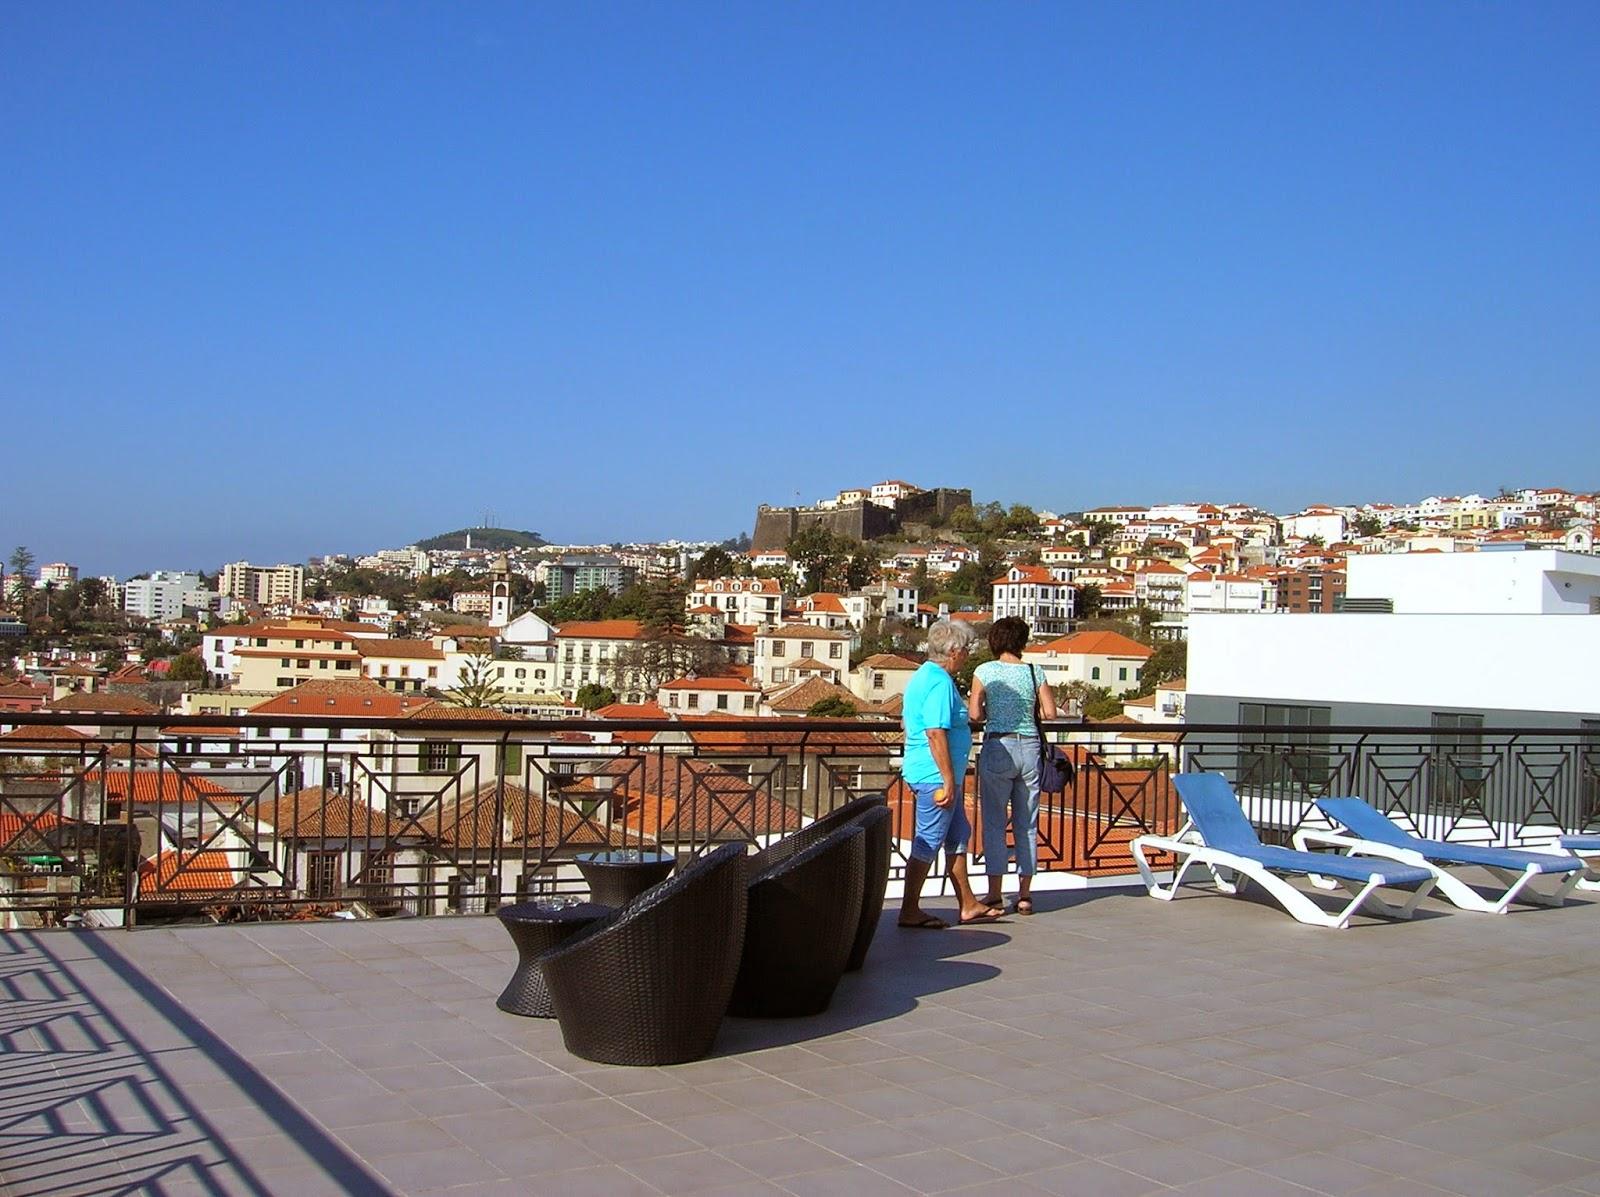 Hotel Orquídea,  Castelo do Pico (S. Joao Batista), Madeira, Portugal, La vuelta al mundo de Asun y Ricardo, round the world, mundoporlibre.com